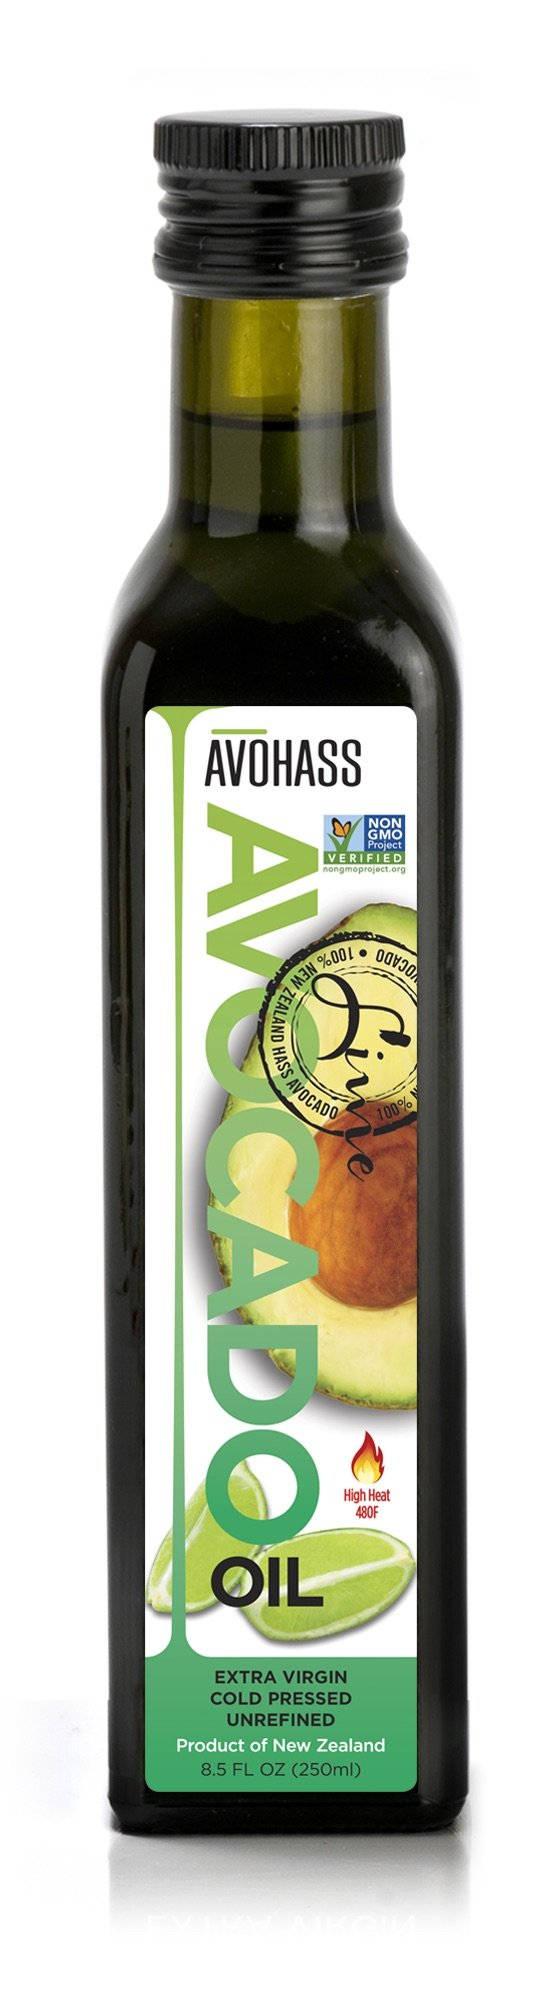 Avohass New Zealand Lime Extra Virgin Avocado Oil 8.5 fl oz